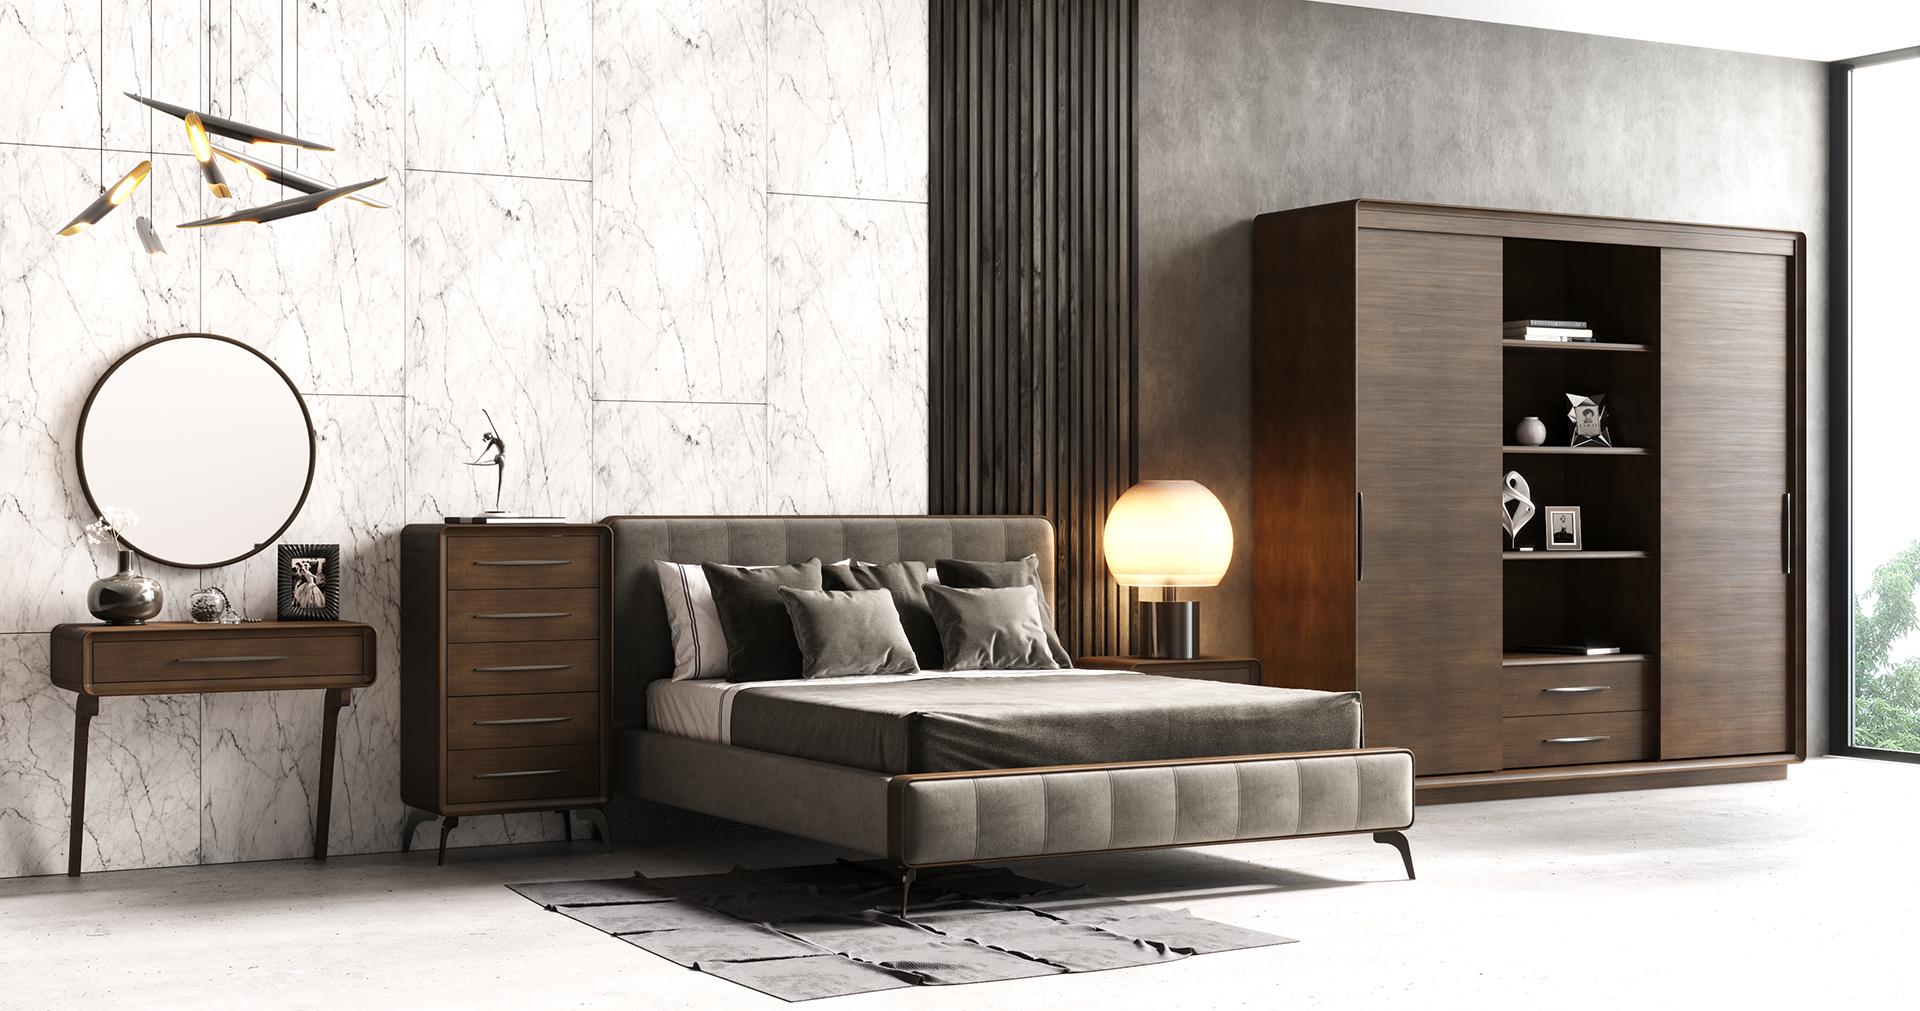 Bedroom_Modena_03